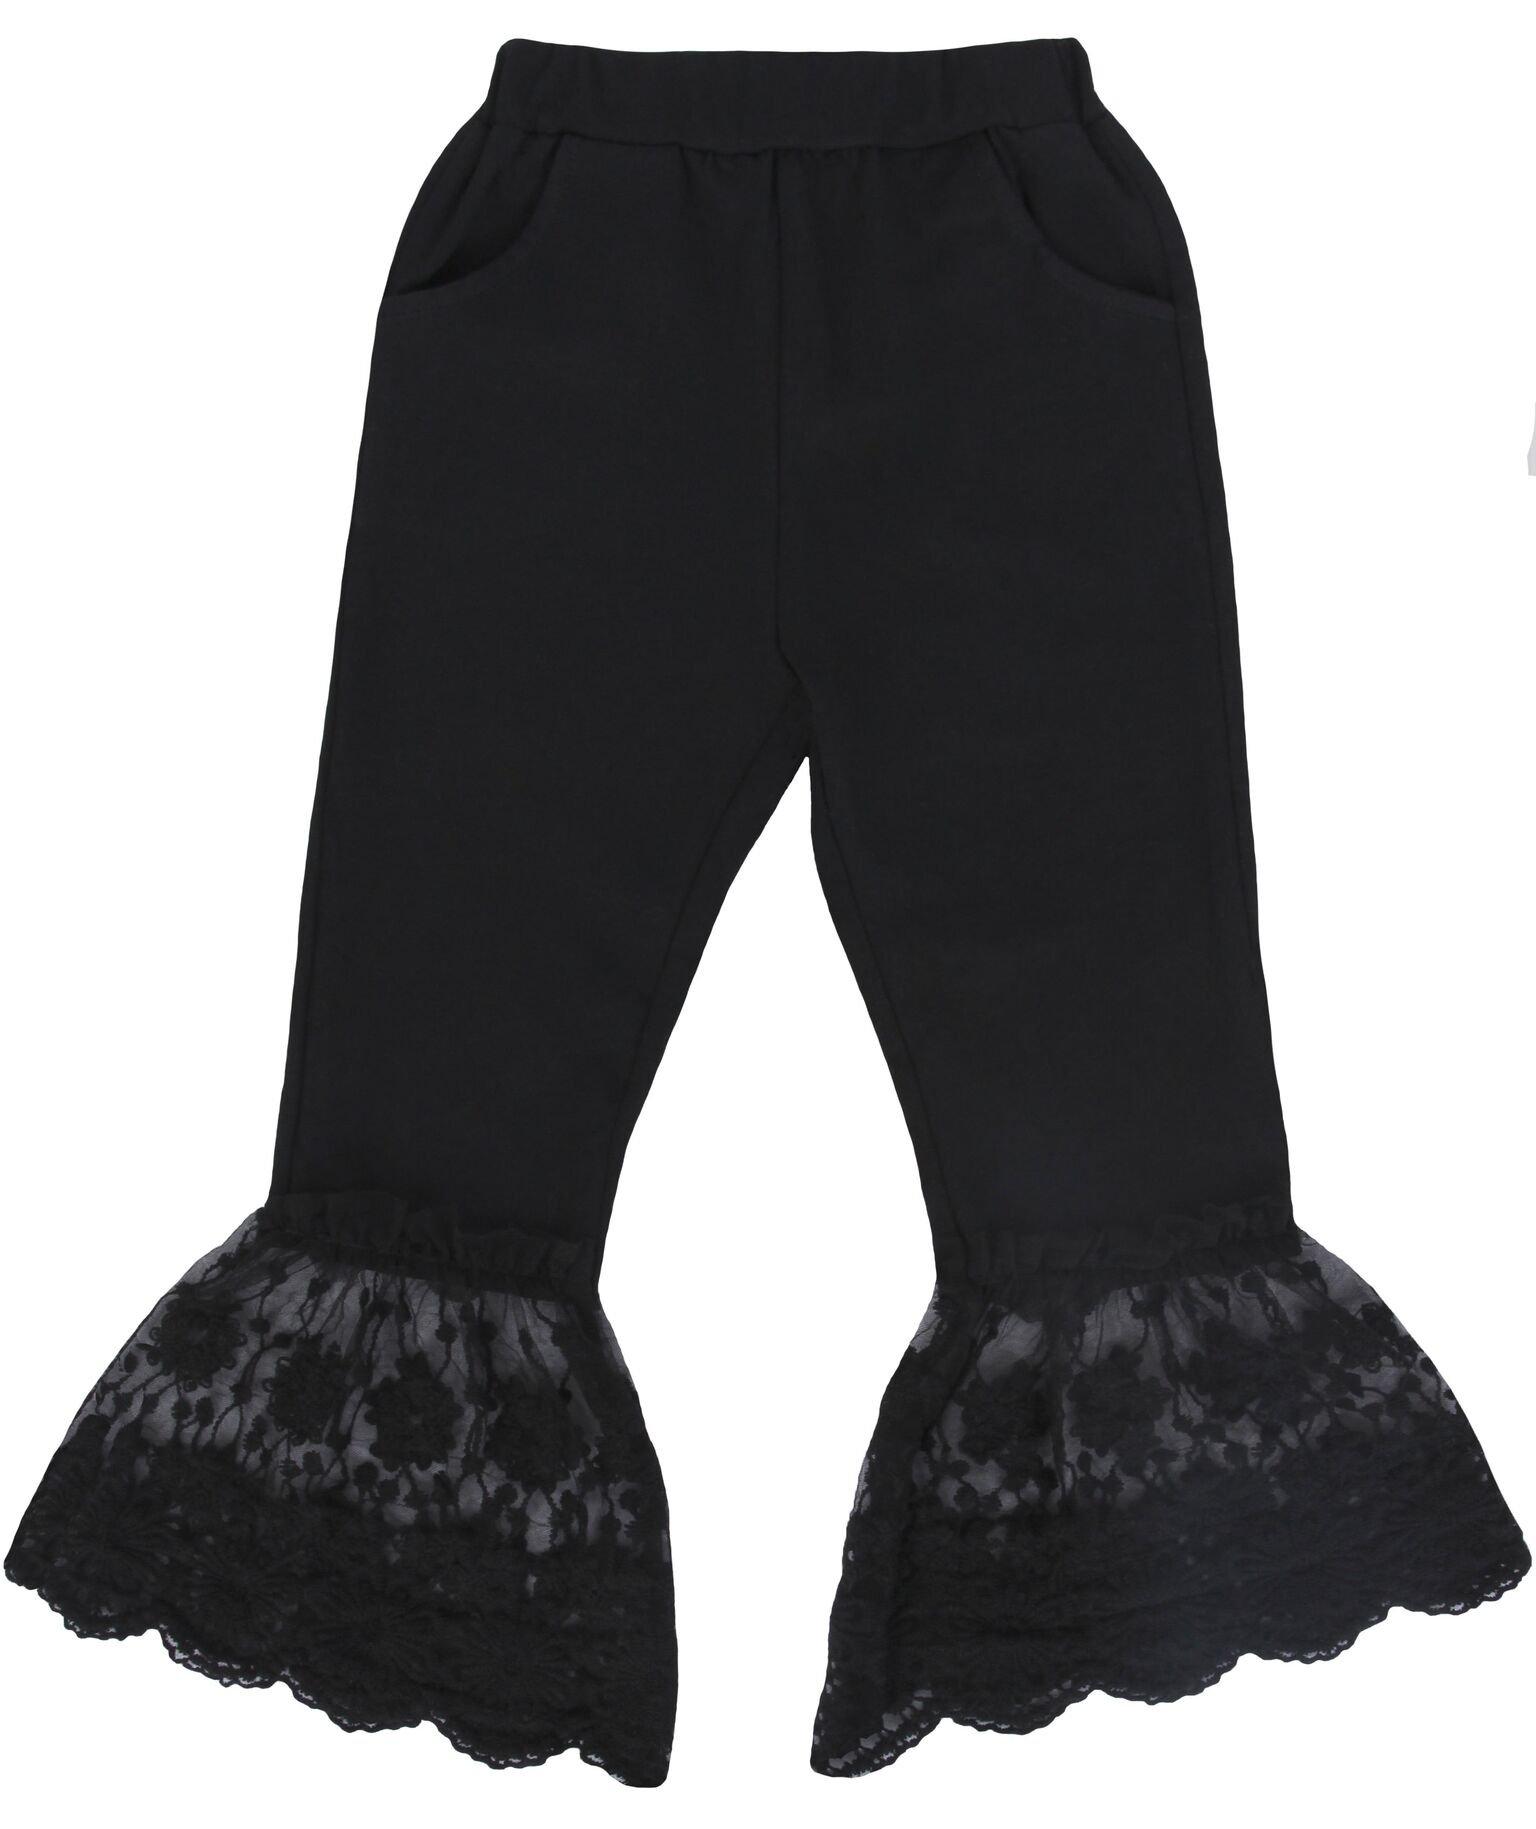 Seven Sisters Lace Bottom Pants (4)